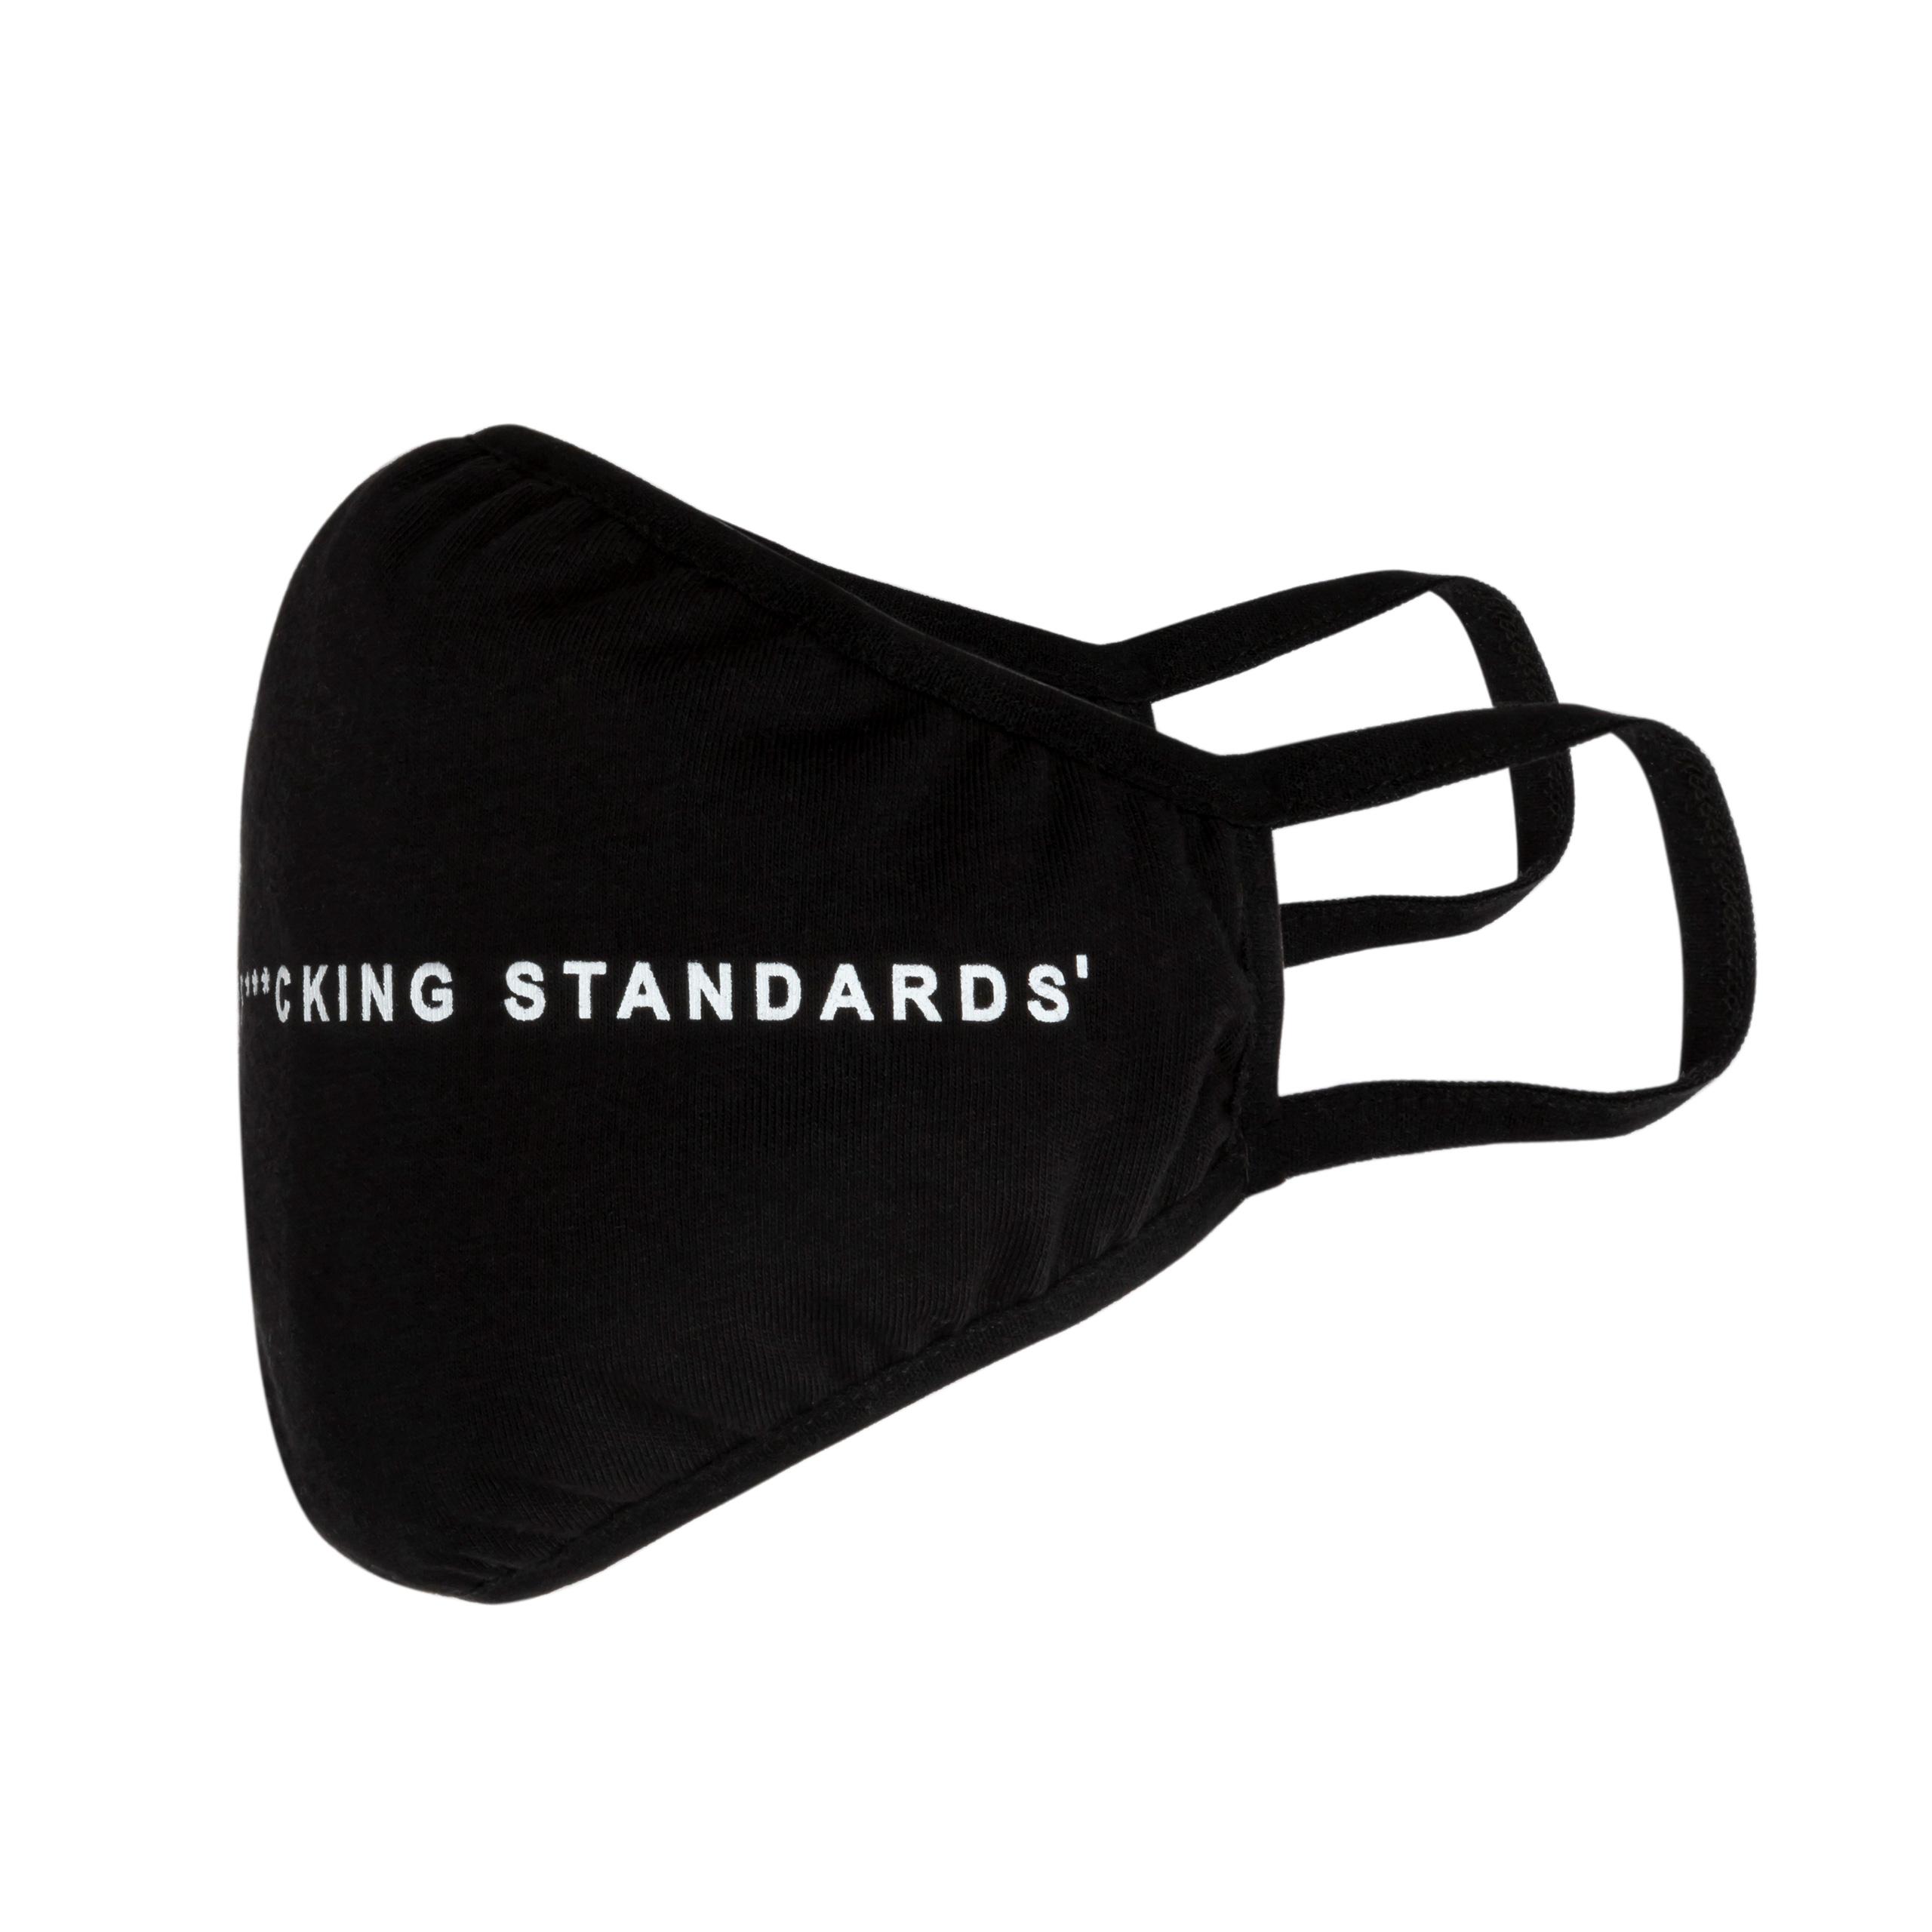 High F**king Standards Face Mask